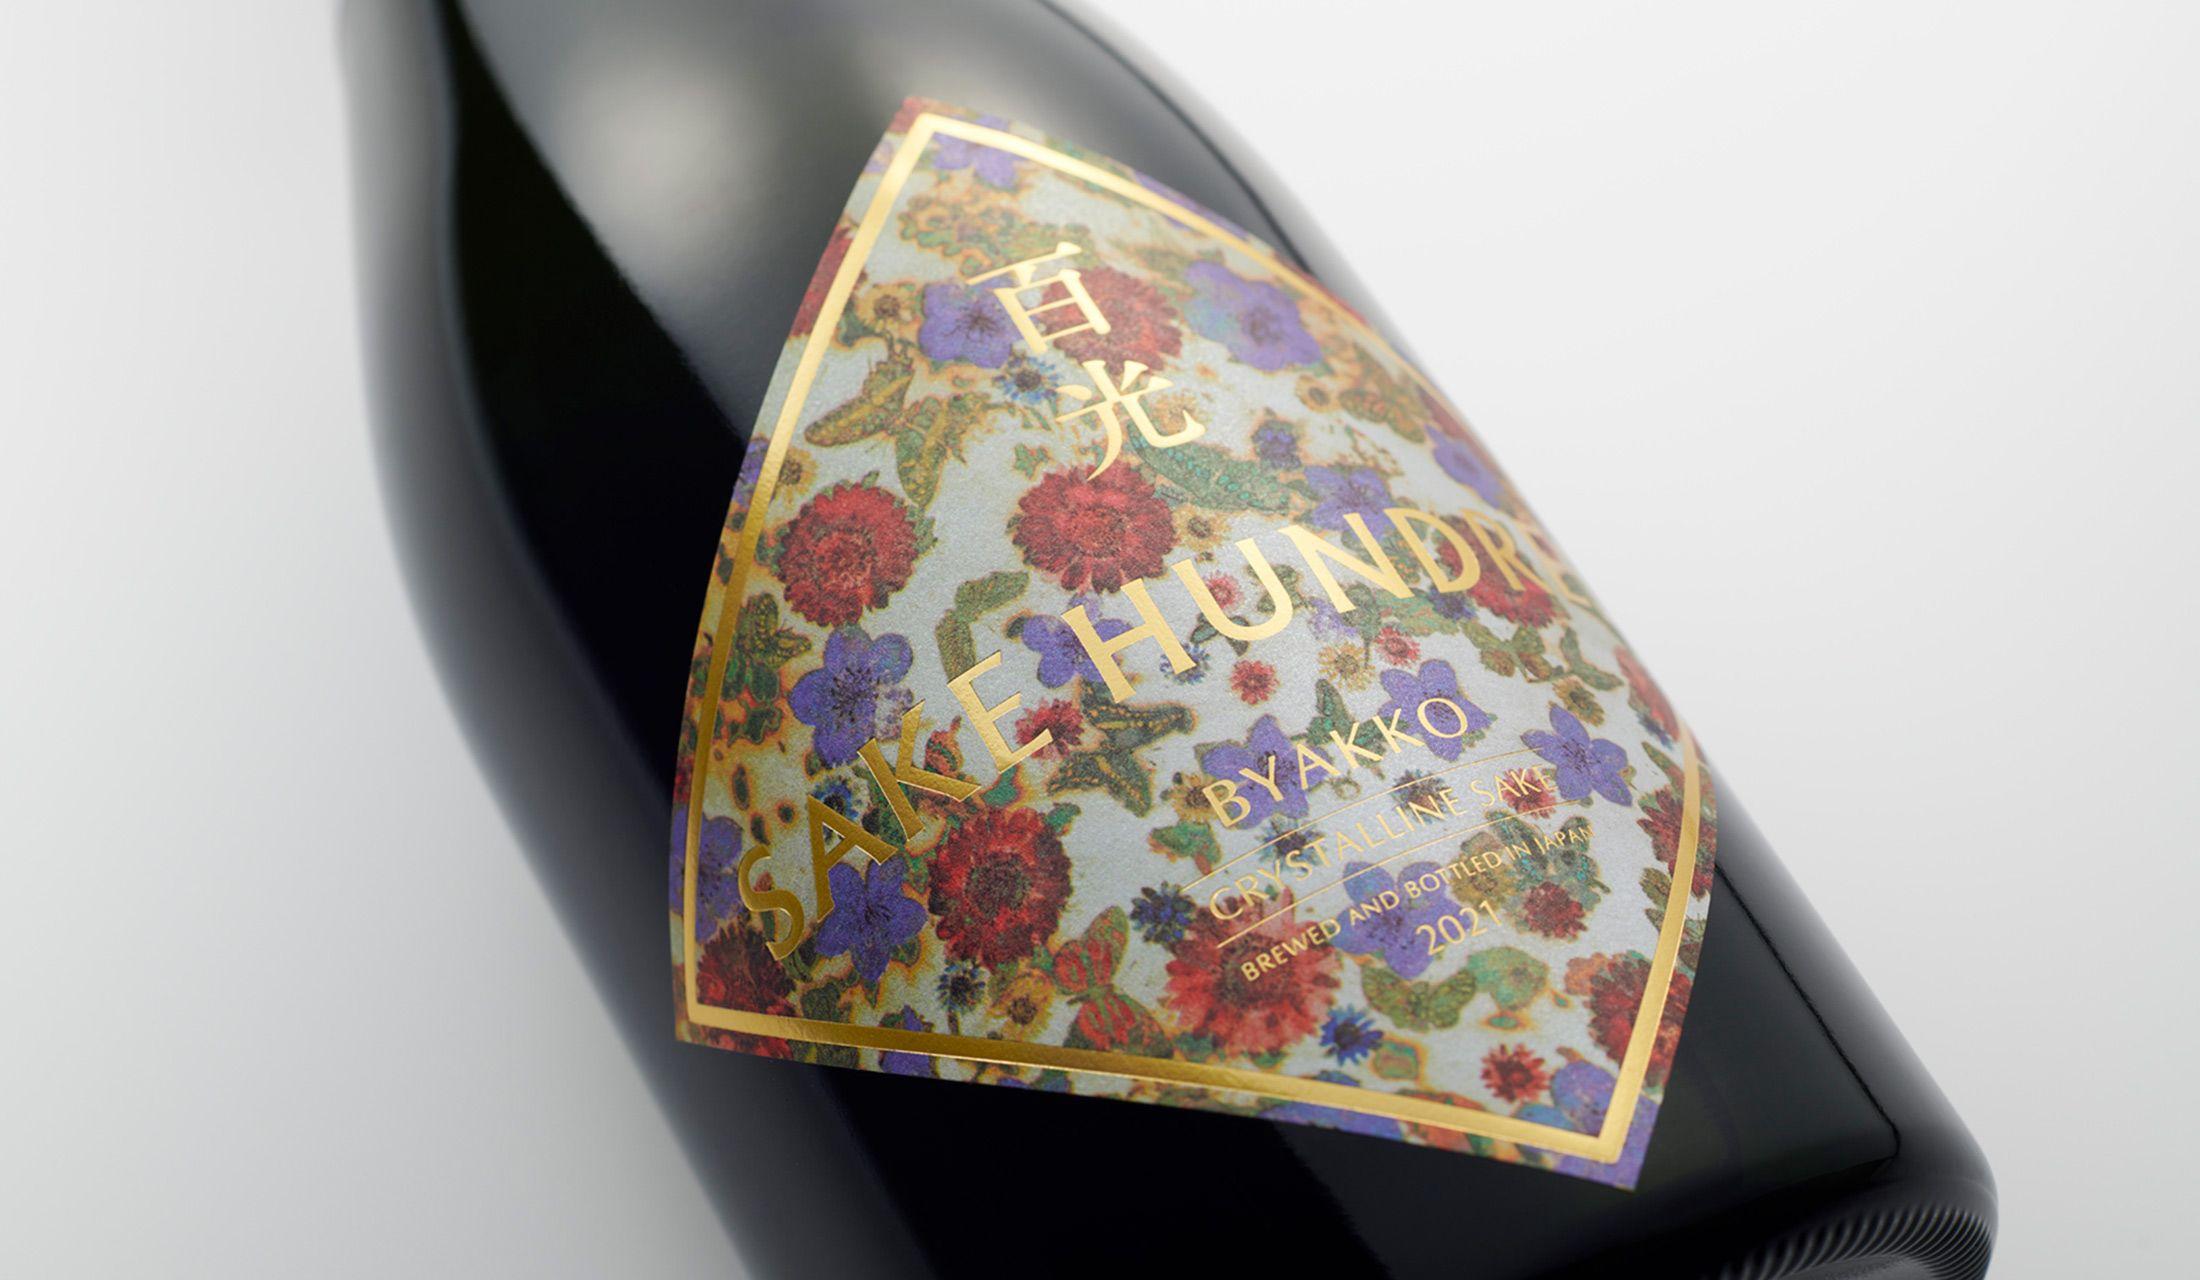 SAKE HUNDRED限定仕様の日本酒「百光 HIROKO OTAKE EDITION」